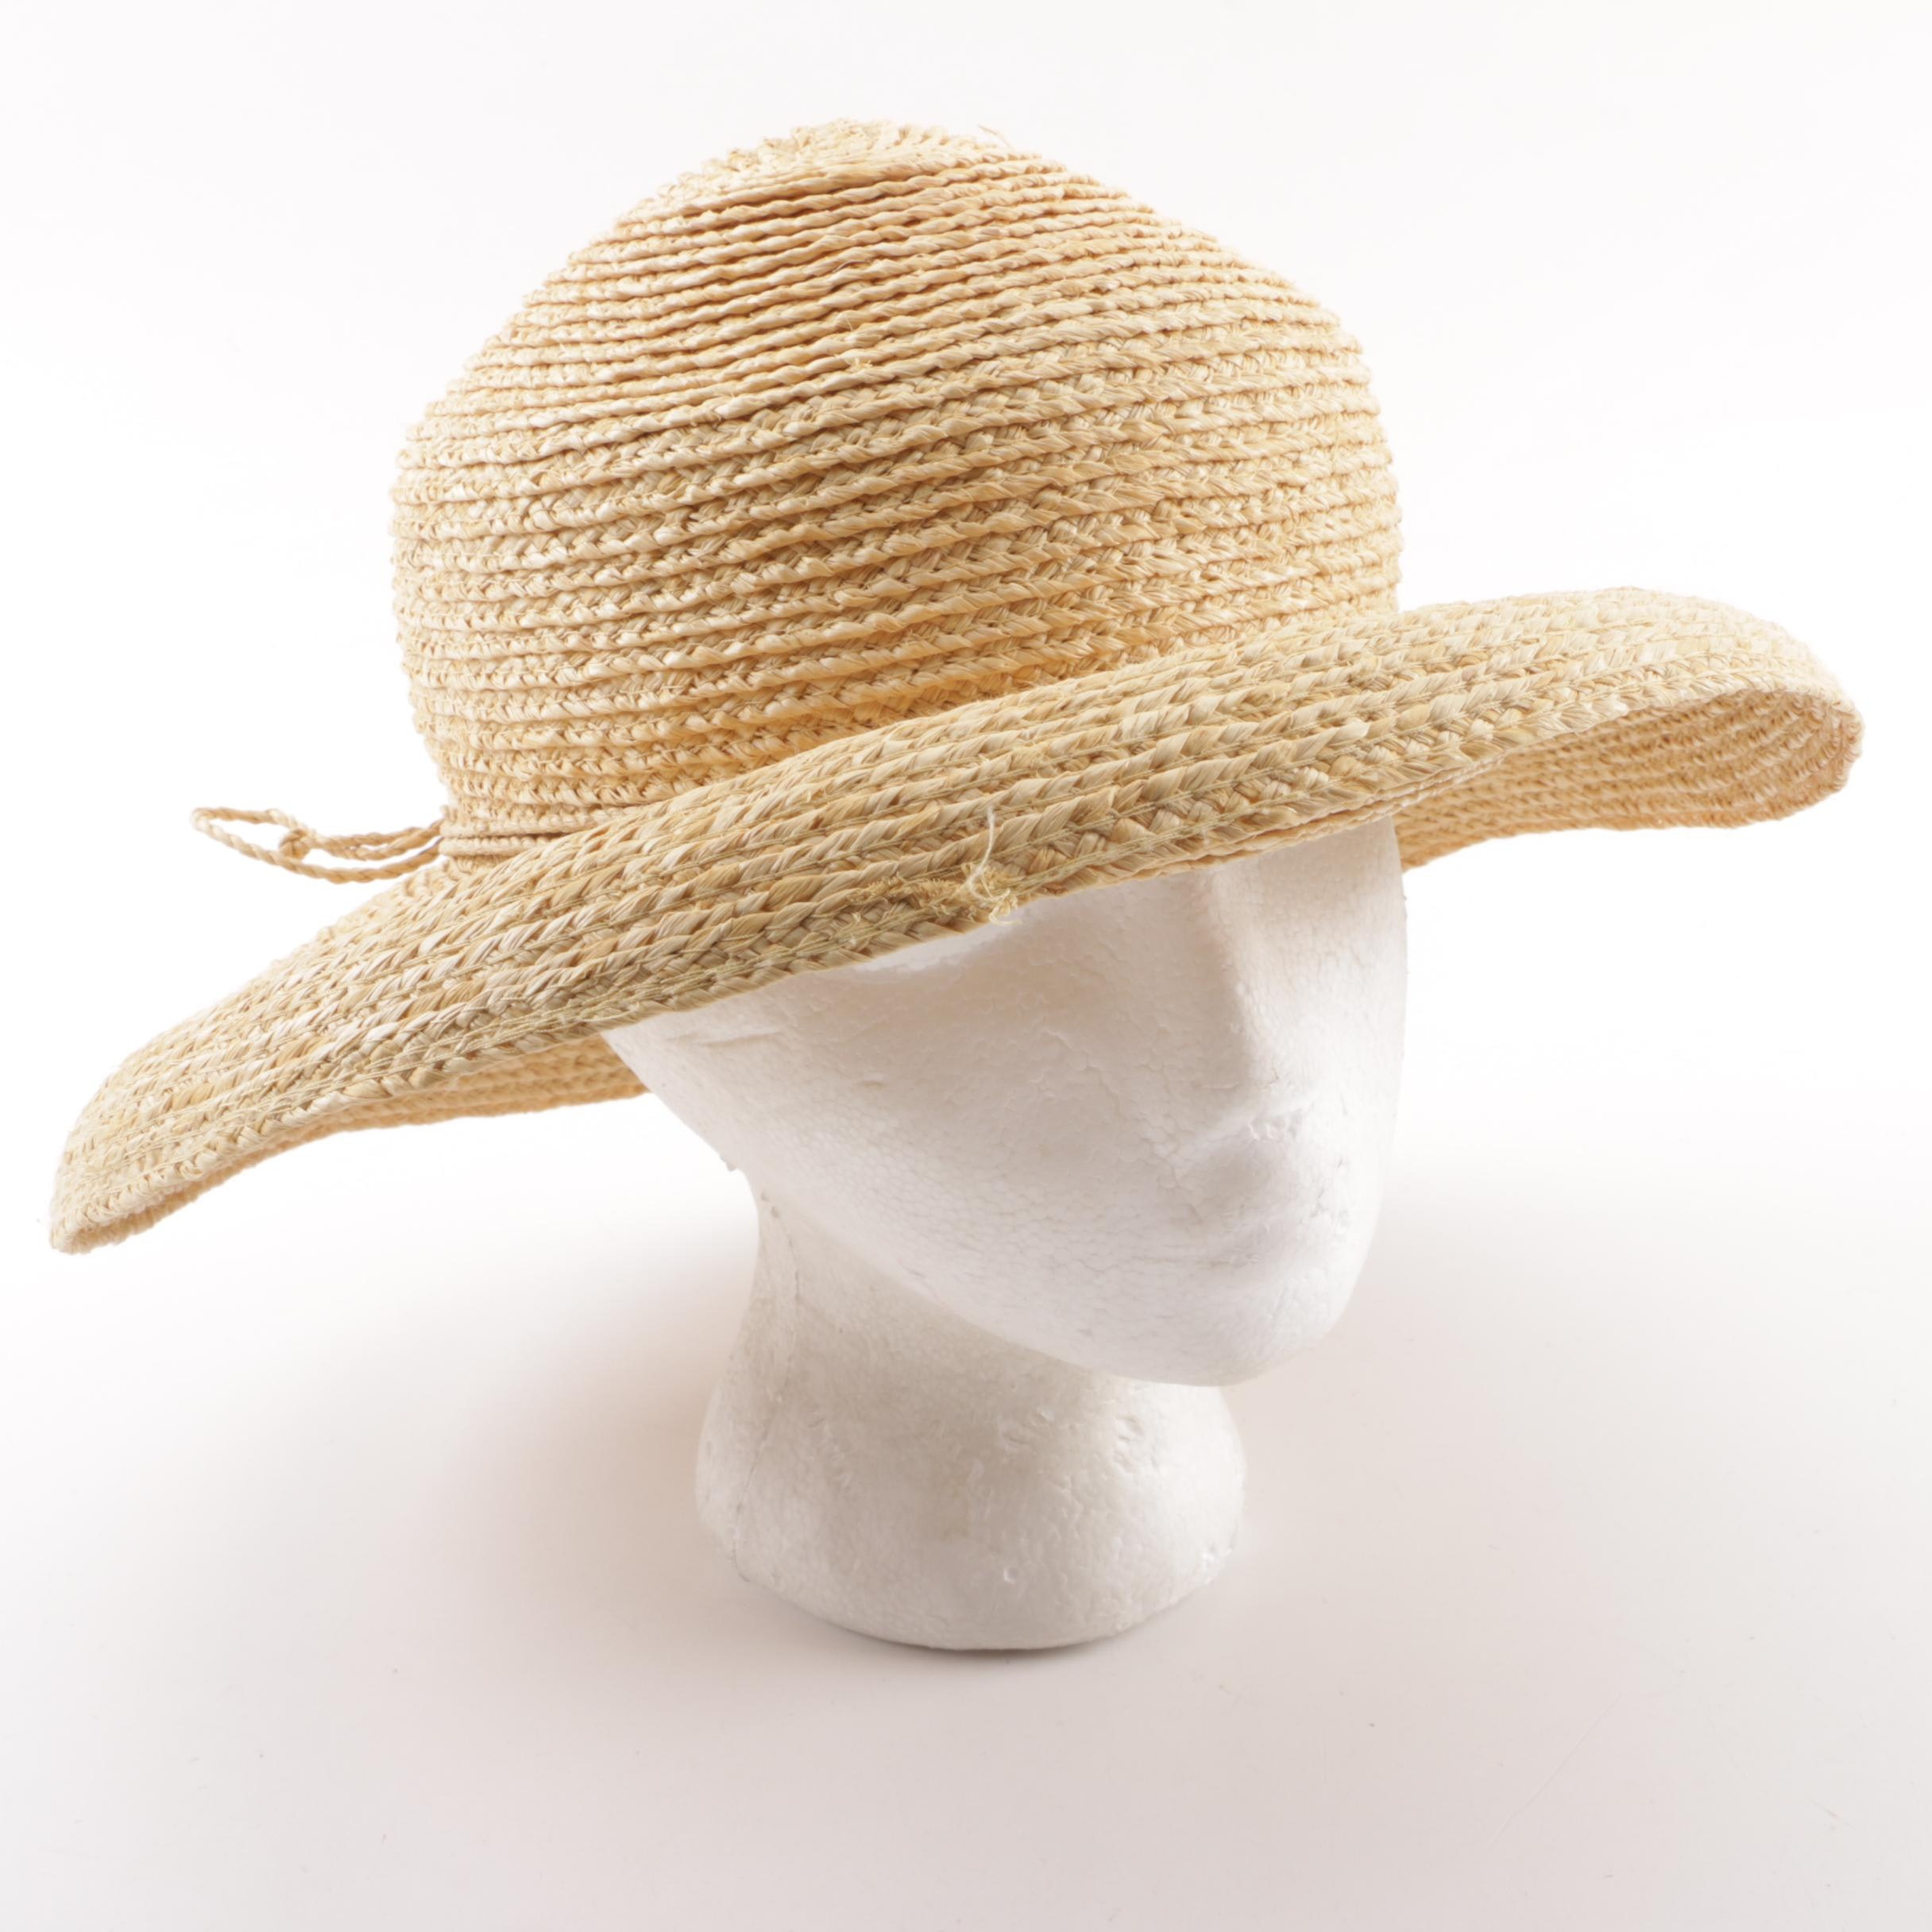 Women's Helen Kaminski of Australia Woven Raffia Wide Brim Hat